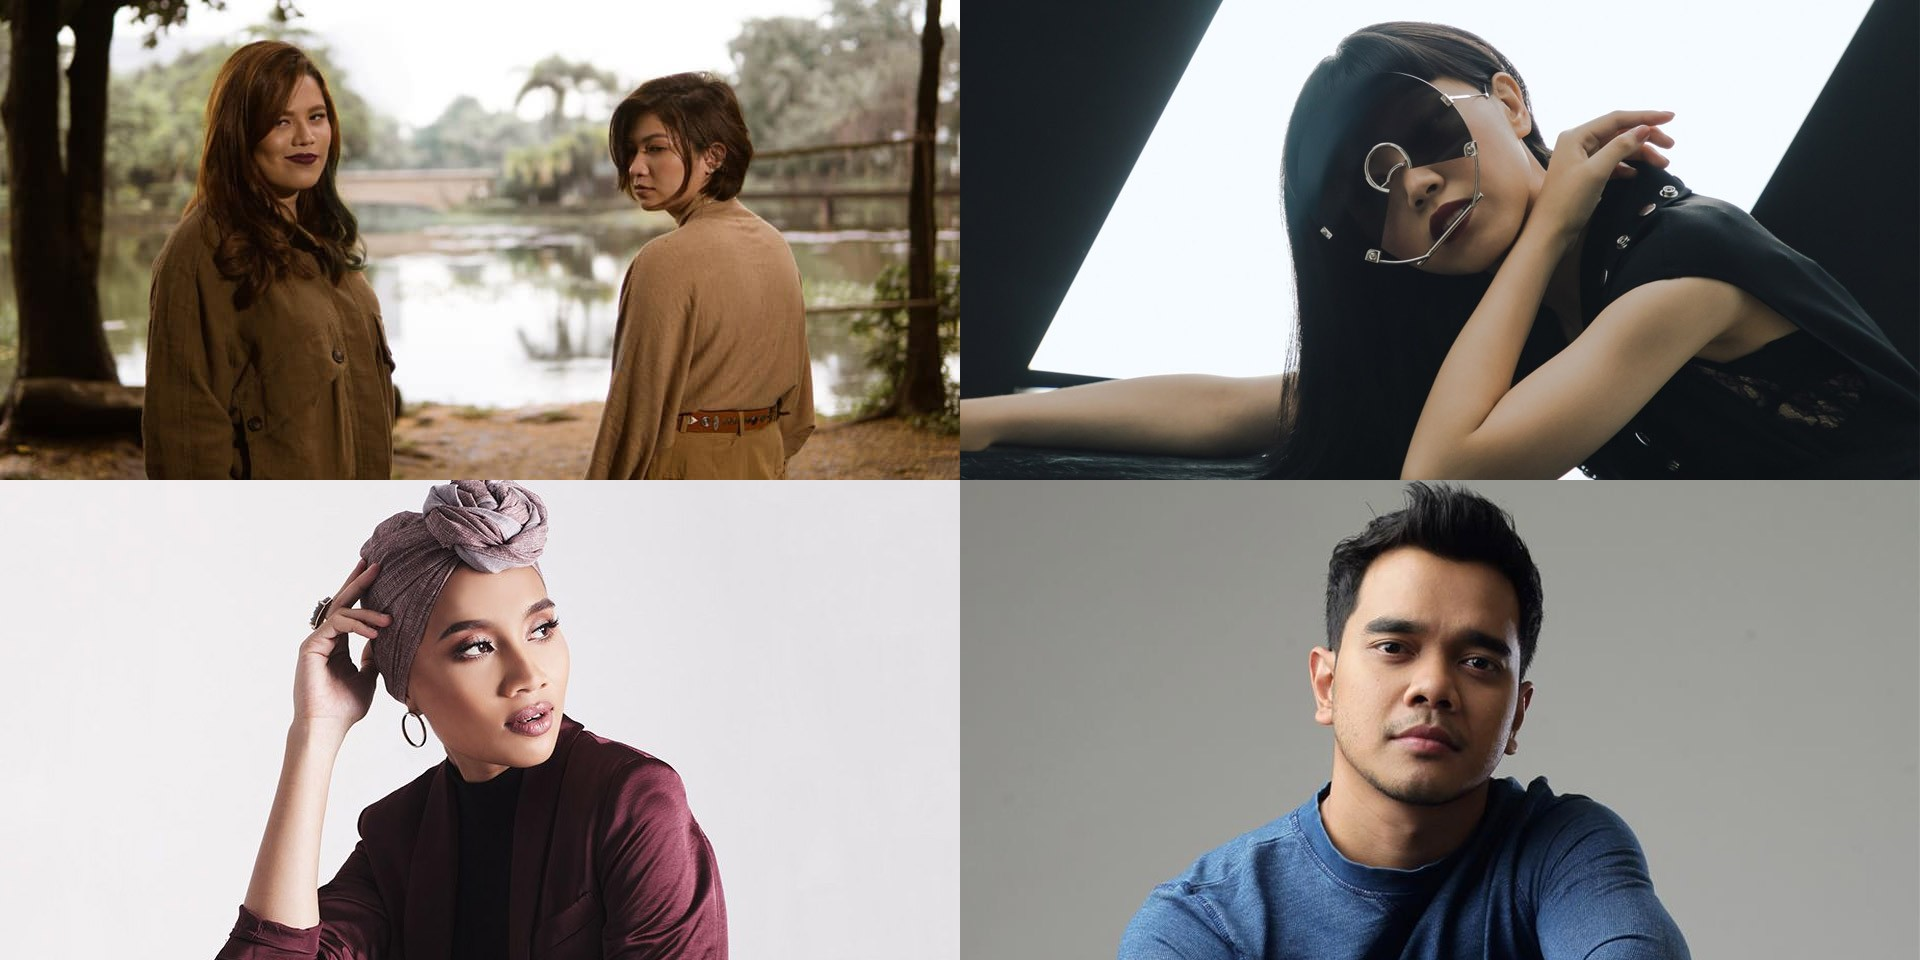 Leanne & Naara, Yuna, Jasmine Sokko, Alif Satar, and more share their quarantine playlists on At Home With Apple Music